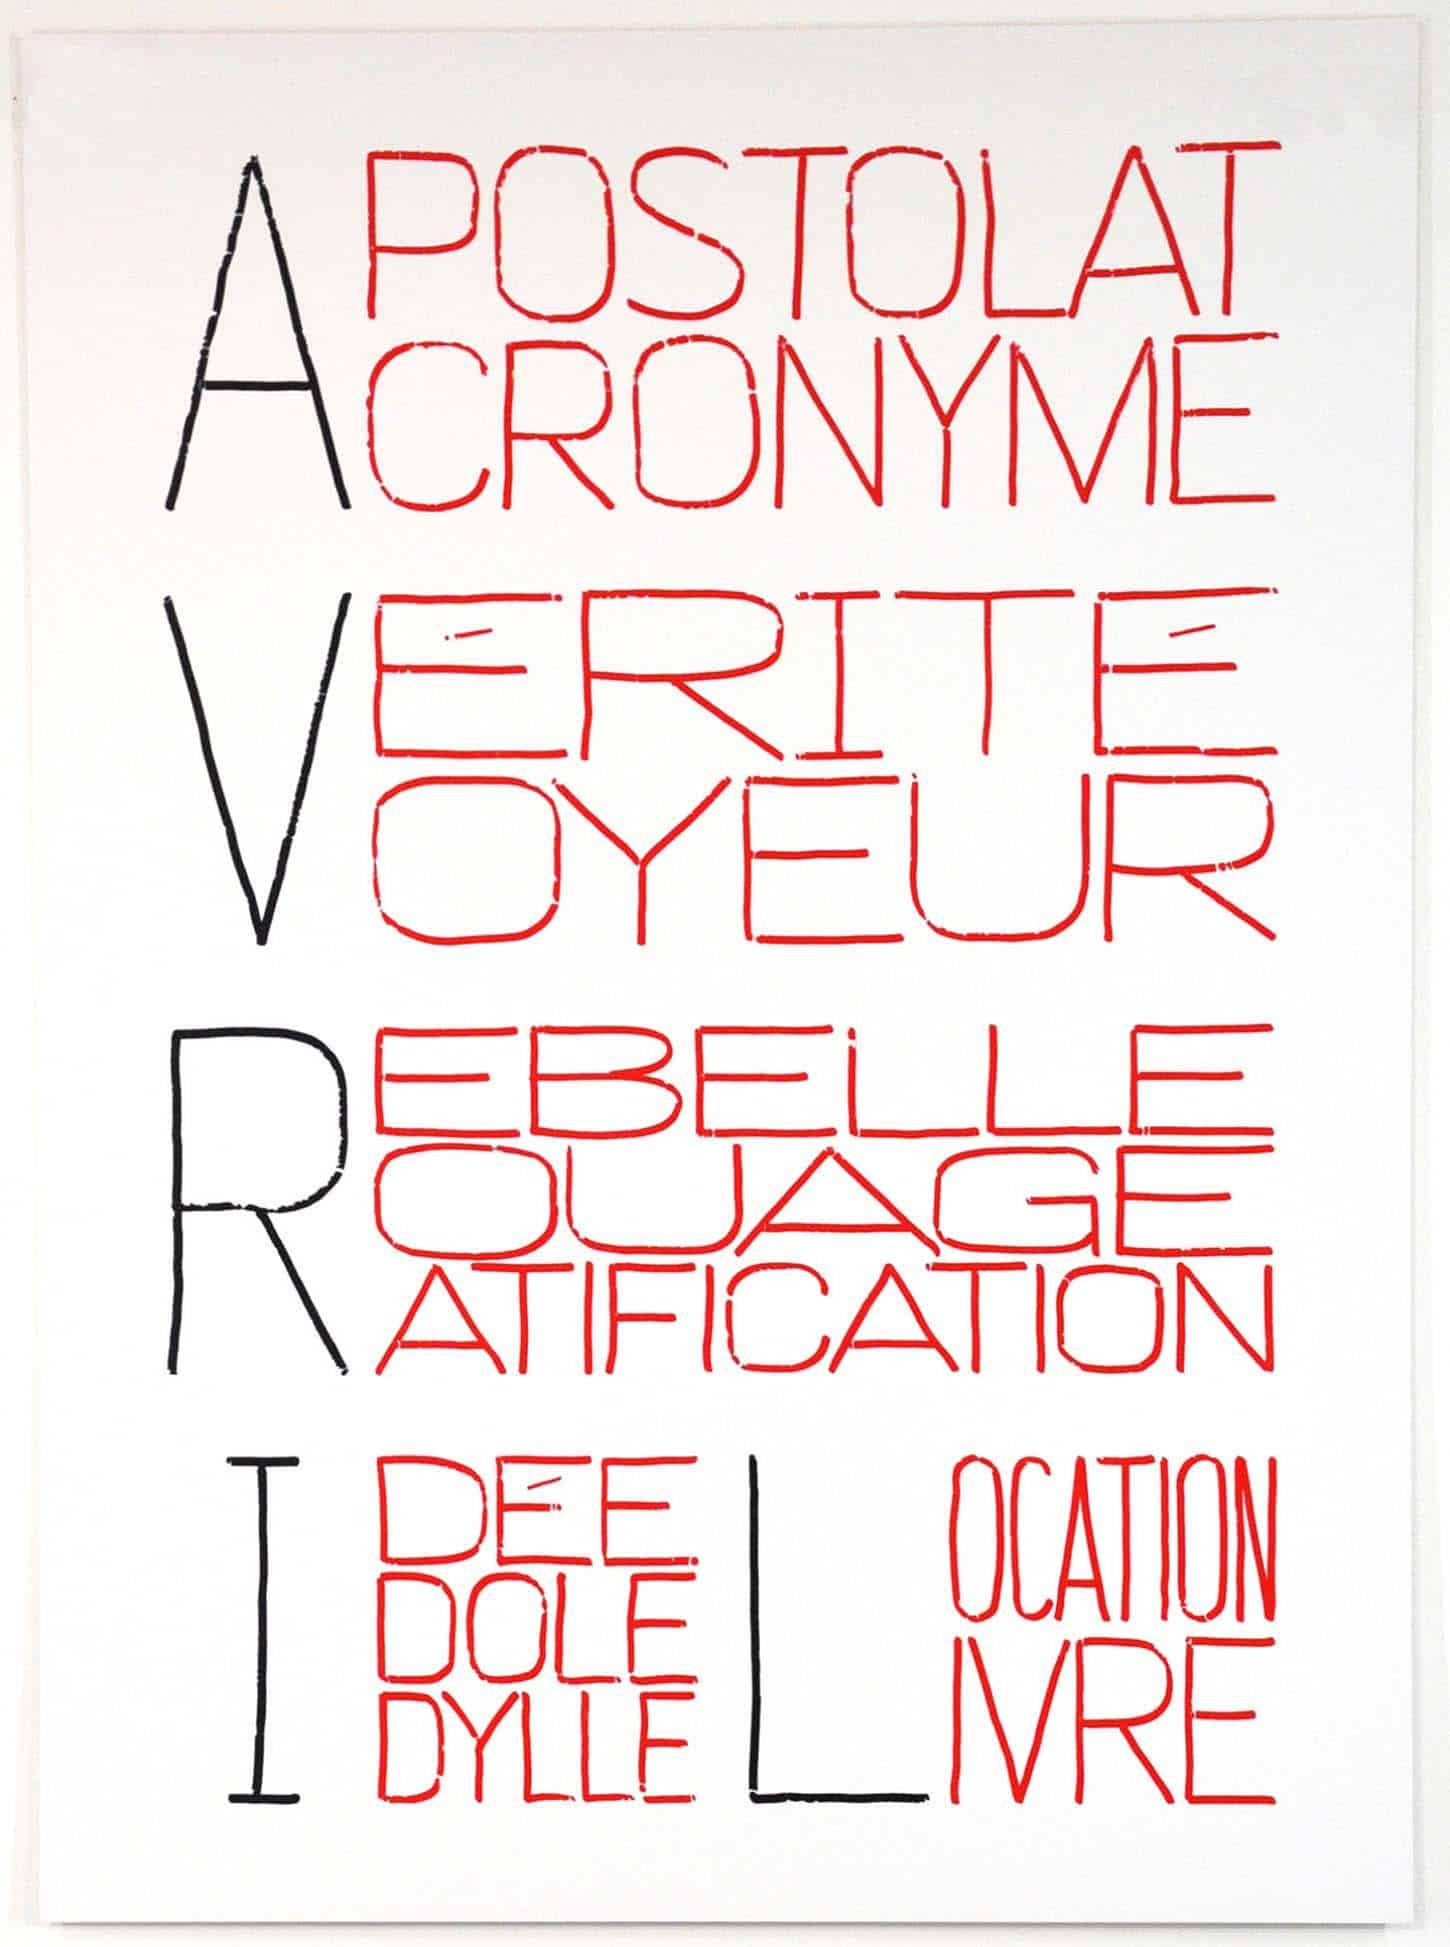 Delphine Coindet Calendrier Anarchiste (Avril), Sérigraphie sur Excellent Silkboard 880 gr, 81,5 x 60 cm, + 3EA s, 2013.